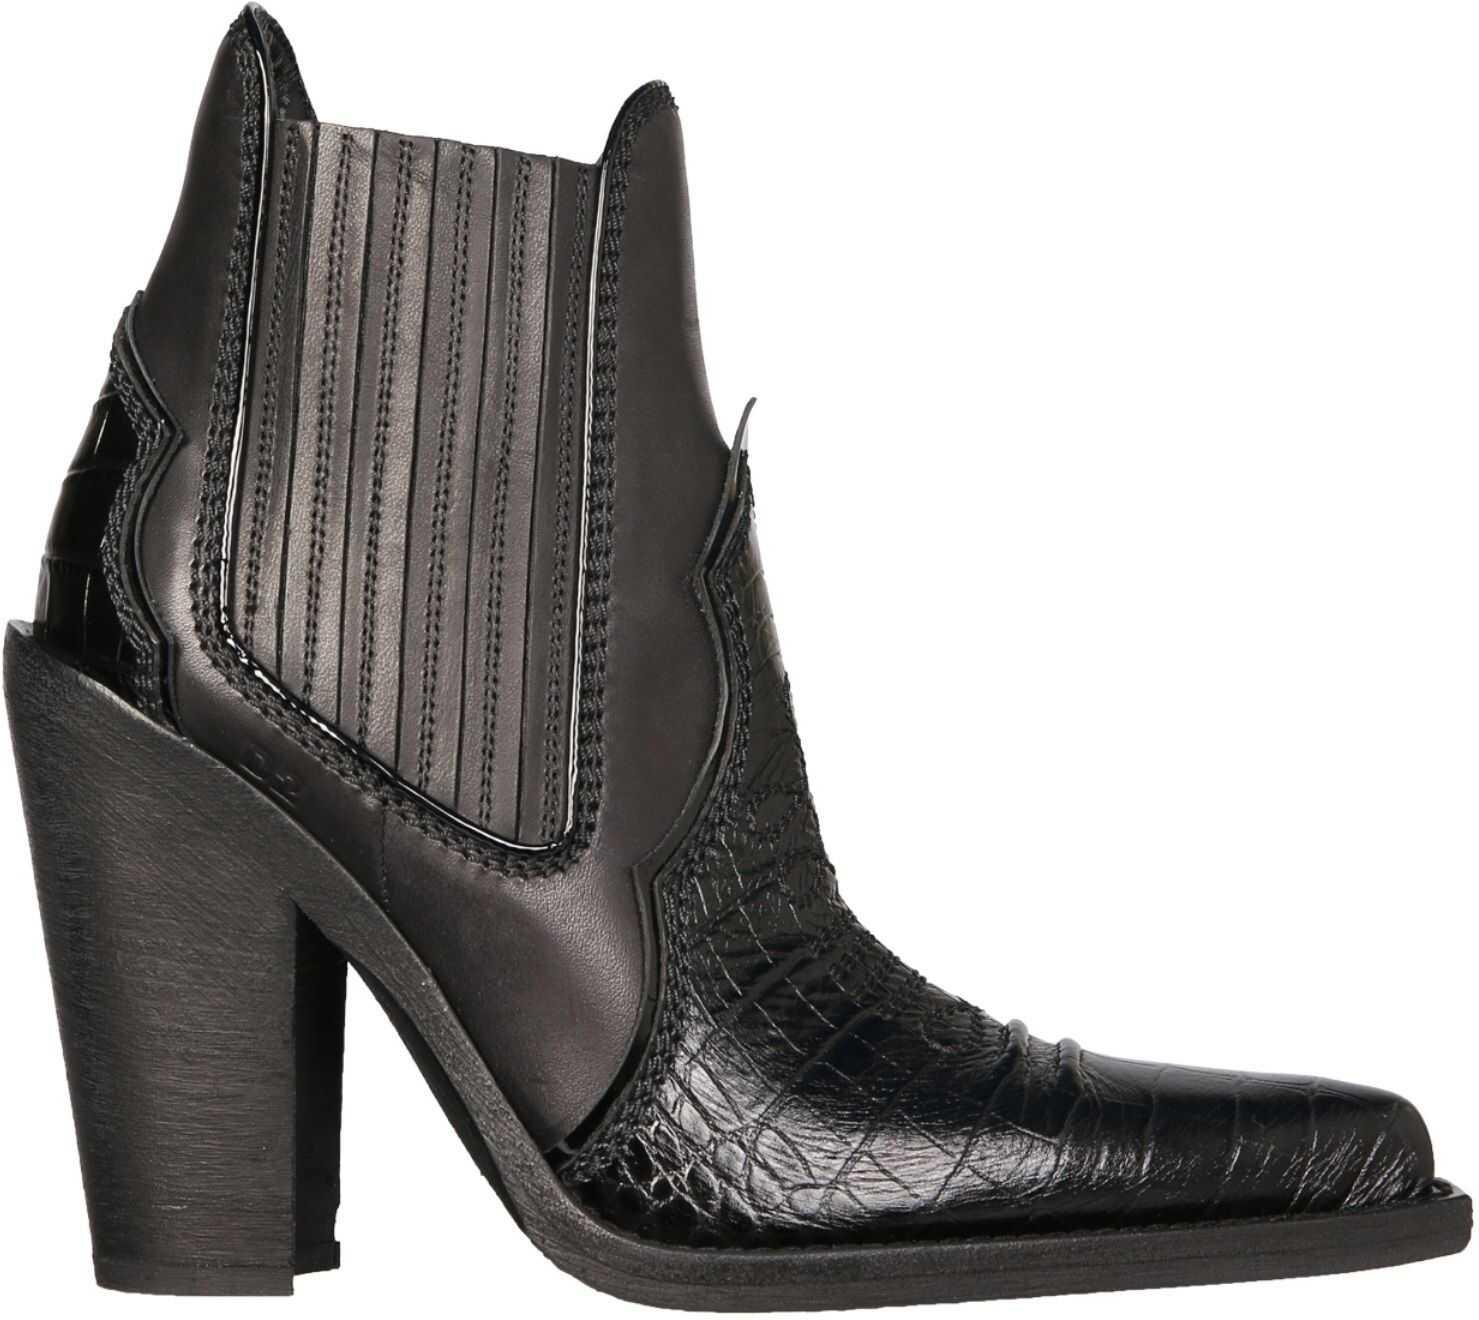 DSQUARED2 Texan Boots ABW0120_02703469M436 BLACK imagine b-mall.ro